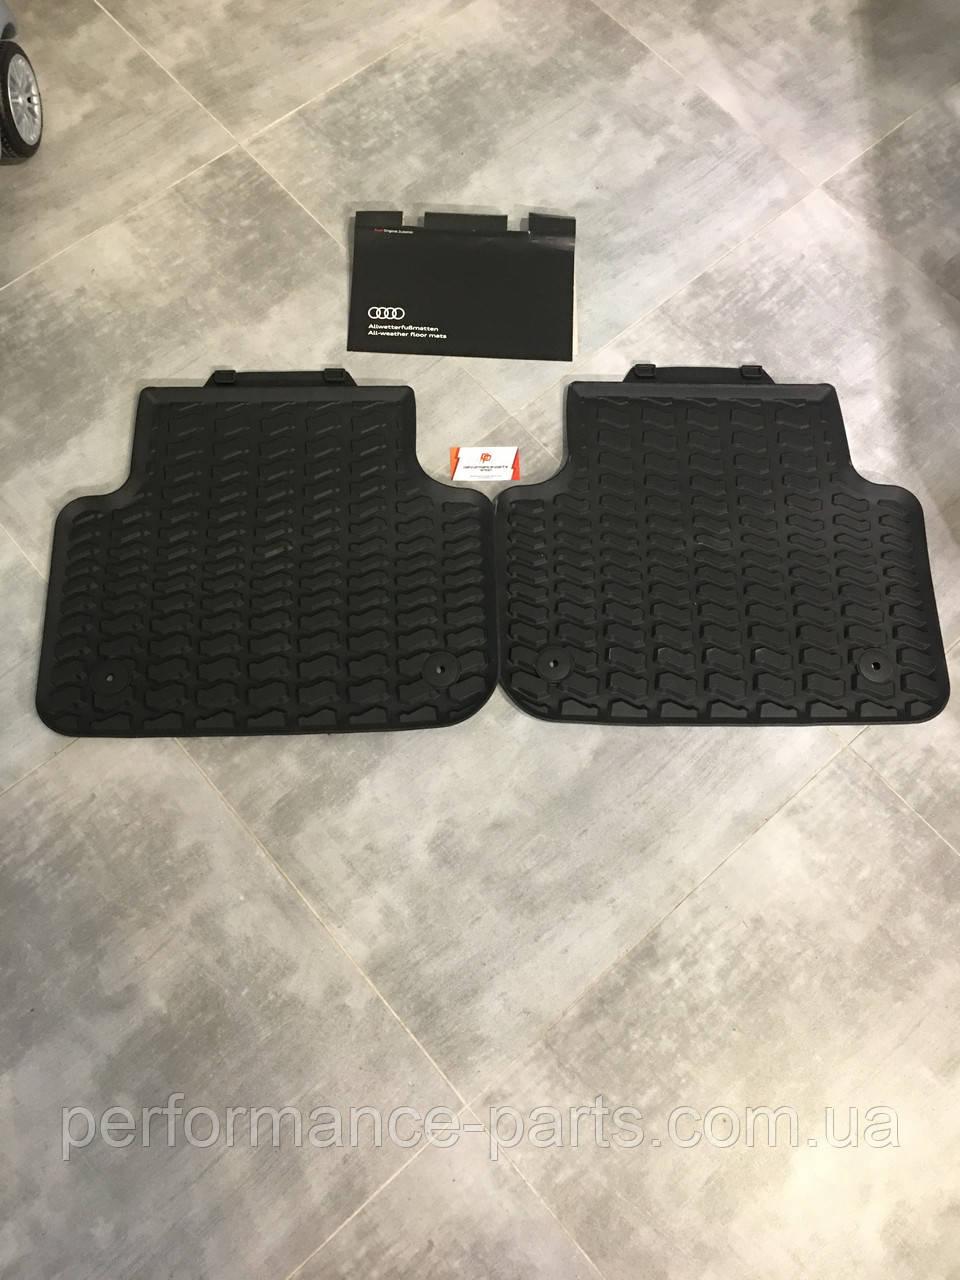 Коврики салона резиновые задние Audi Q8 2019. 4M1061512041. Оригинал.